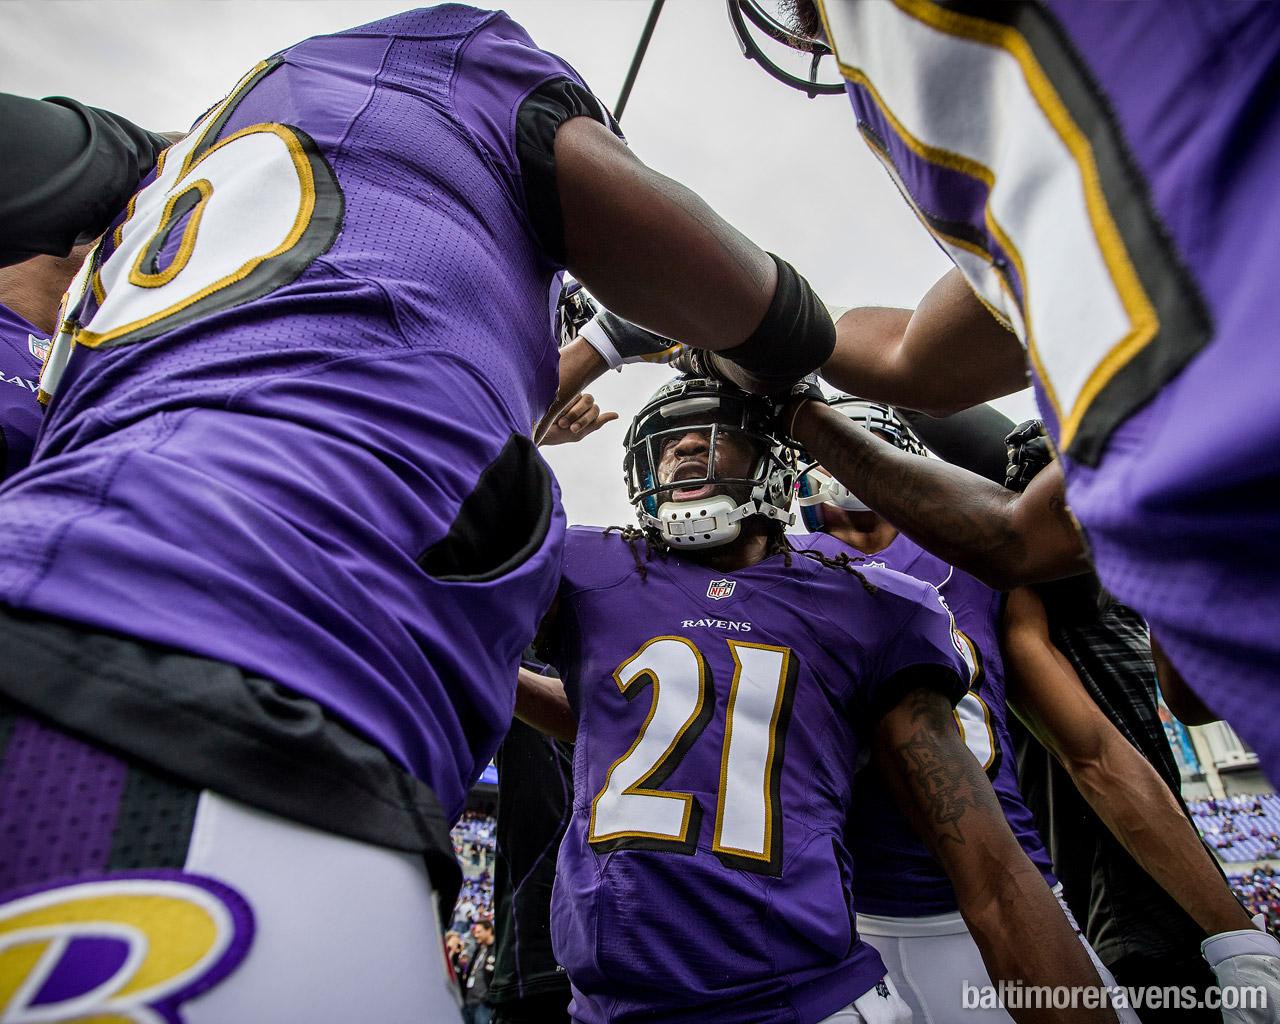 Baltimore Ravens Ravenstown Downloads 1280x1024